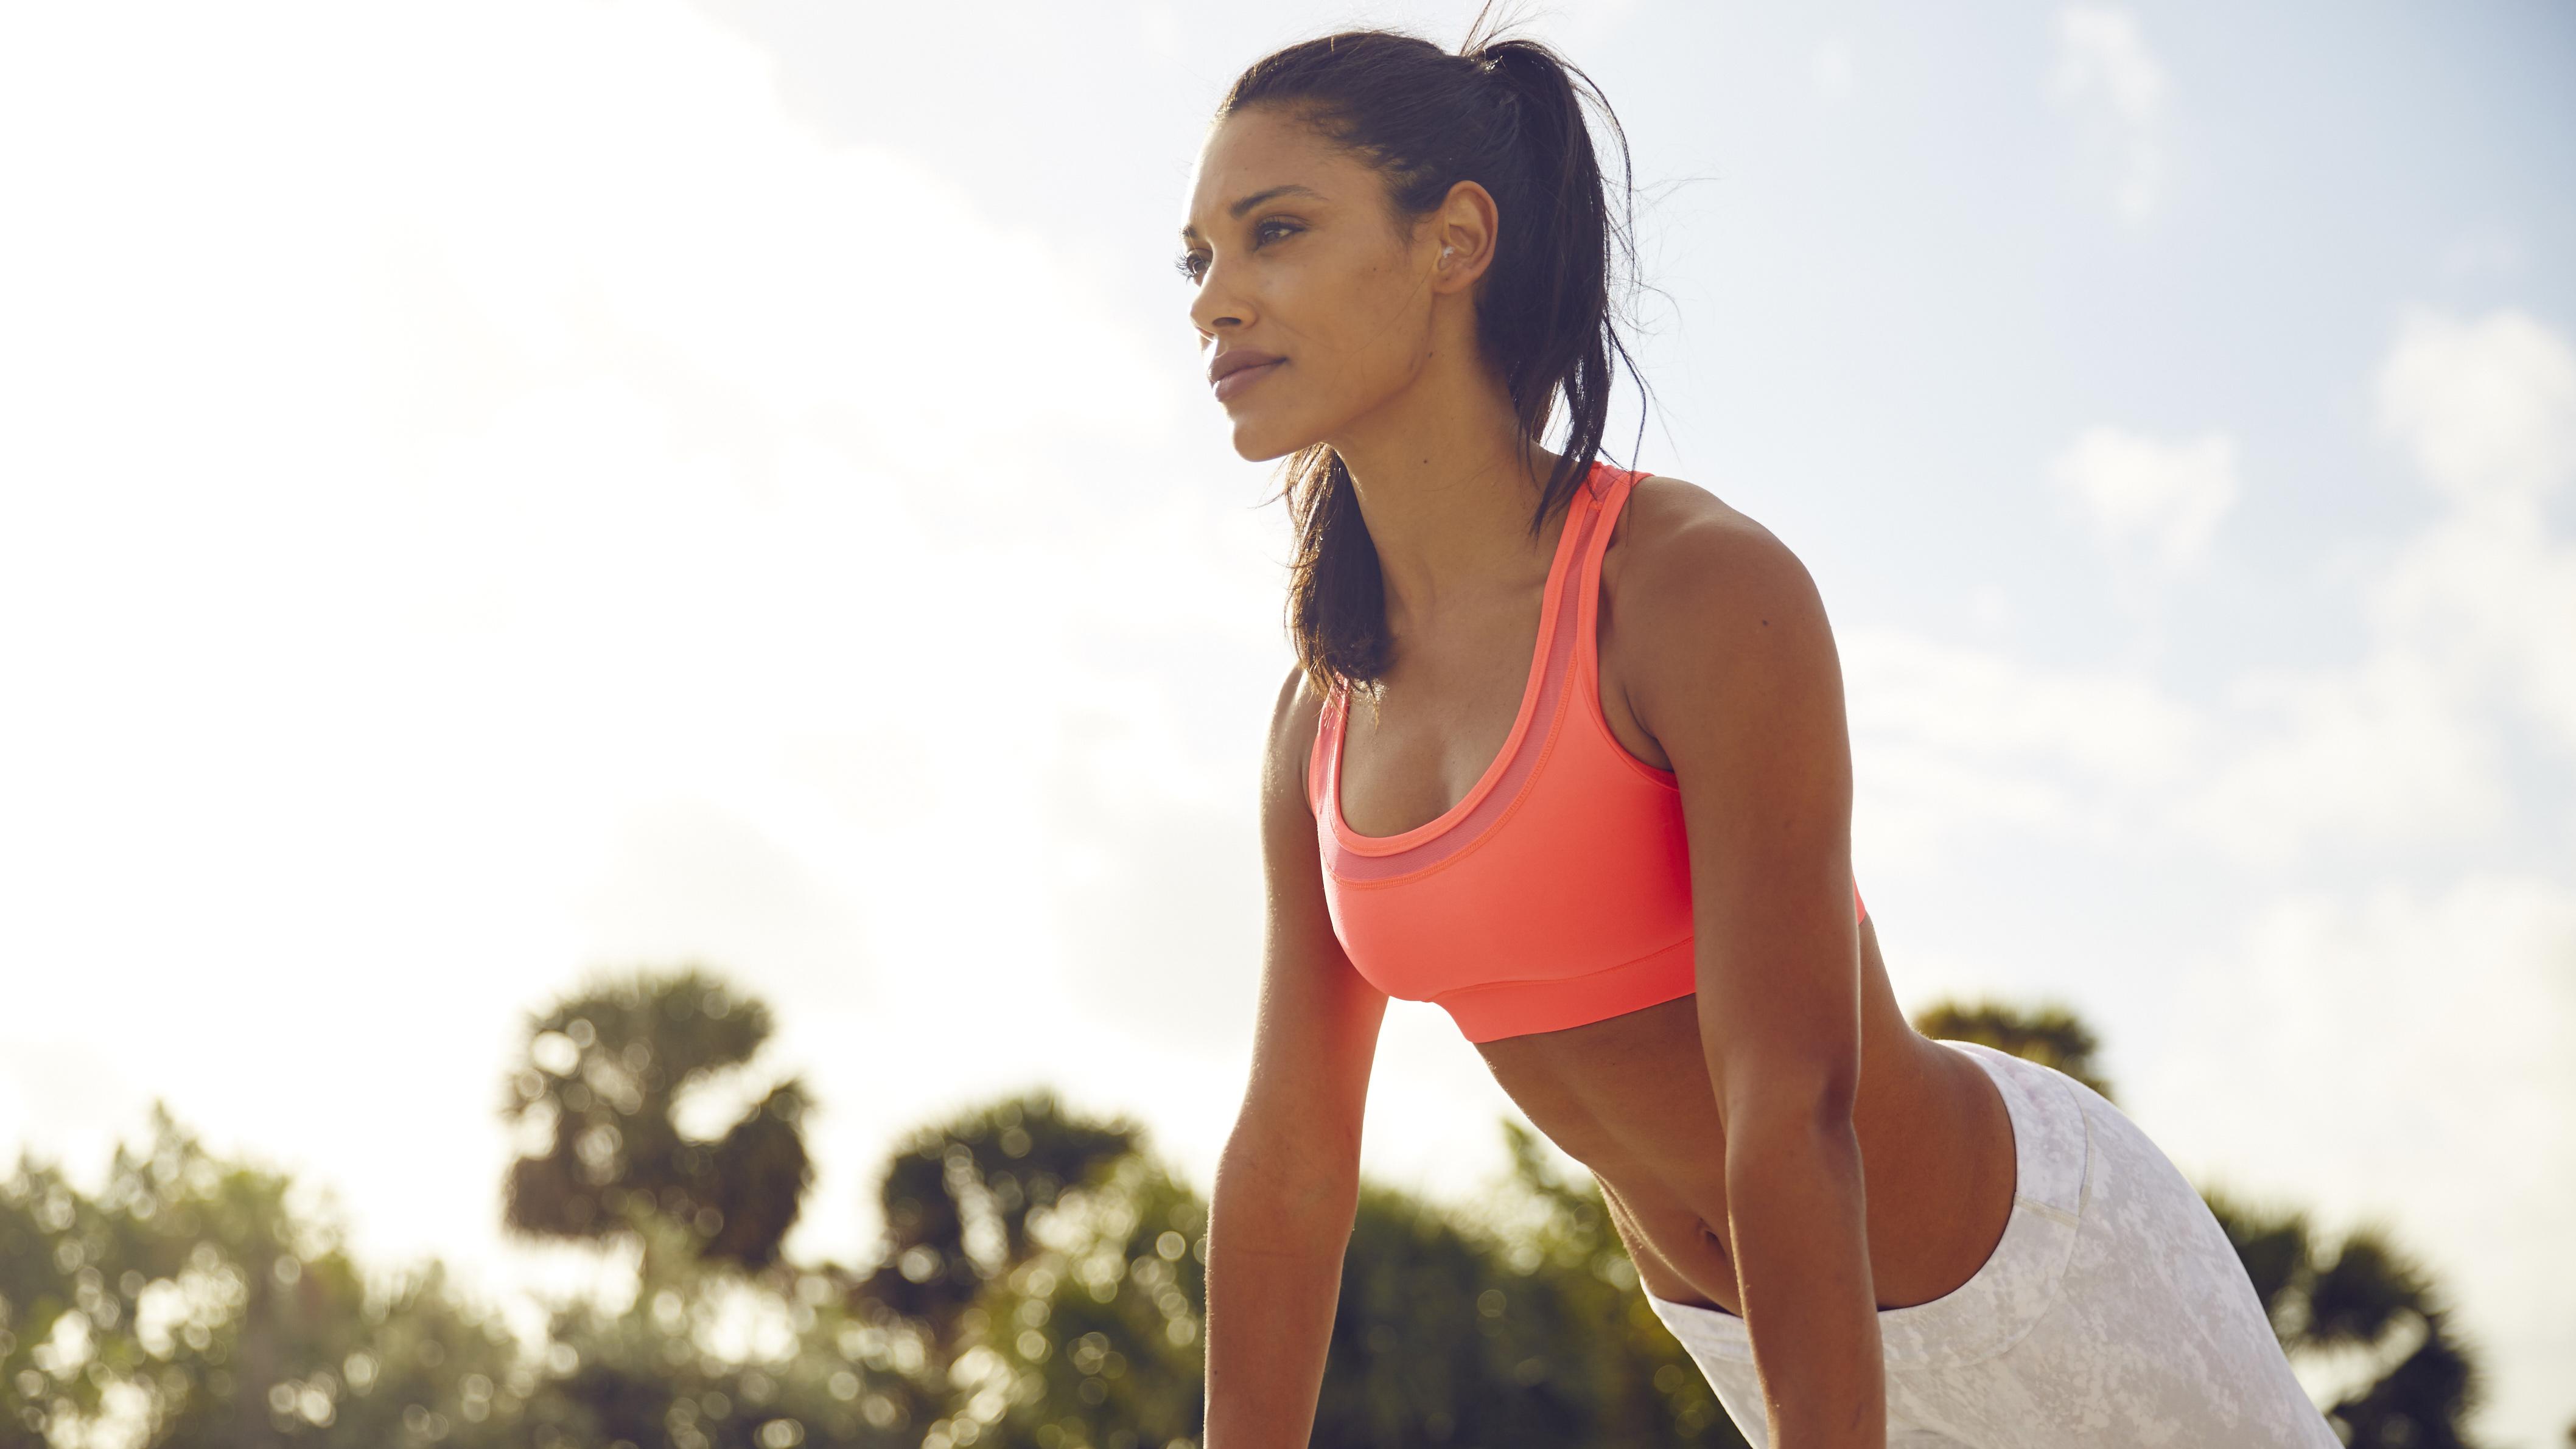 fitness-4232x2381-workout-girl-4k-3820.jpg